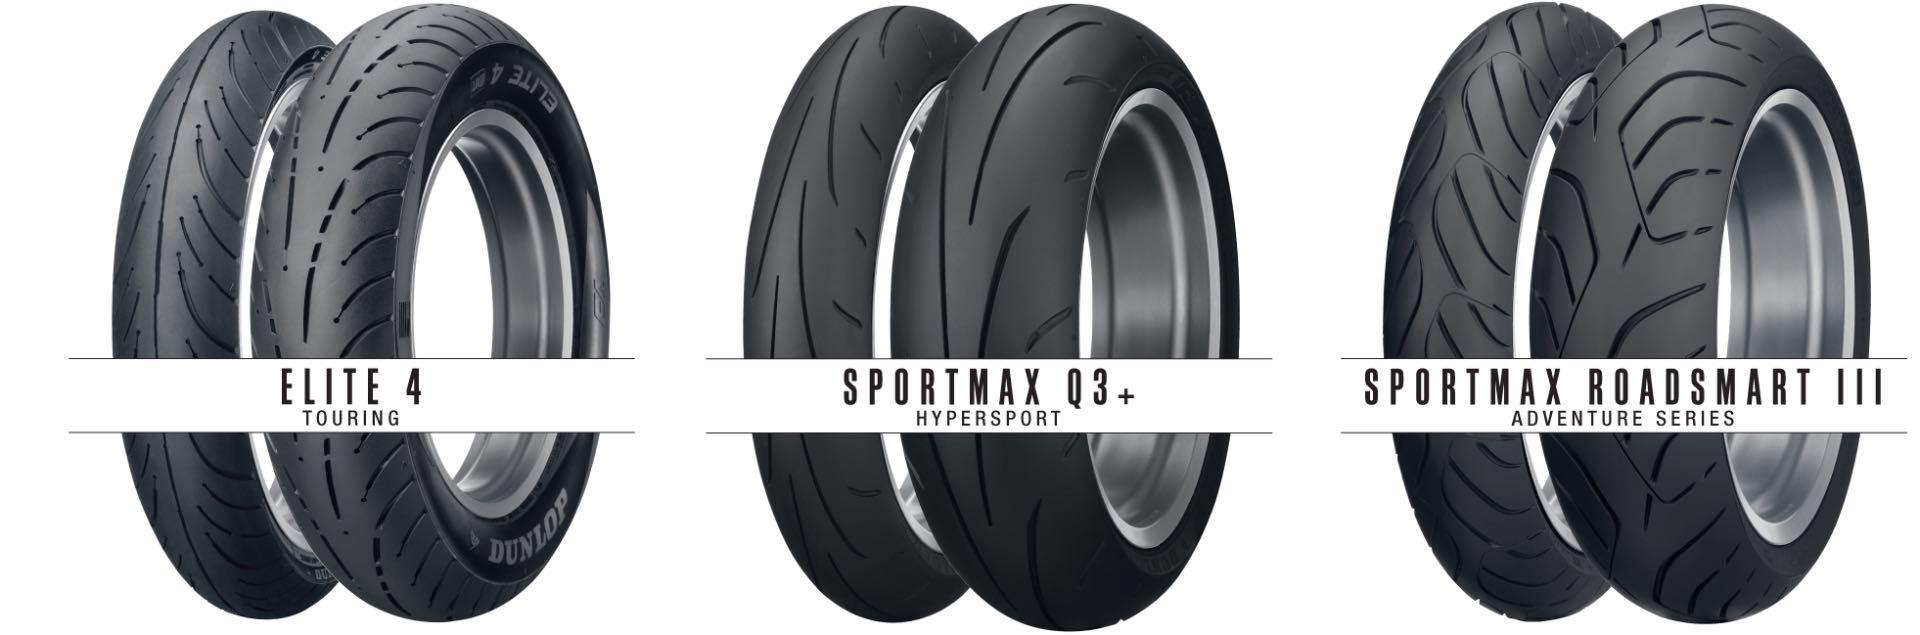 Dunlop: New Sizes Across Sportmax & Elite 4 Motorcycle Tires